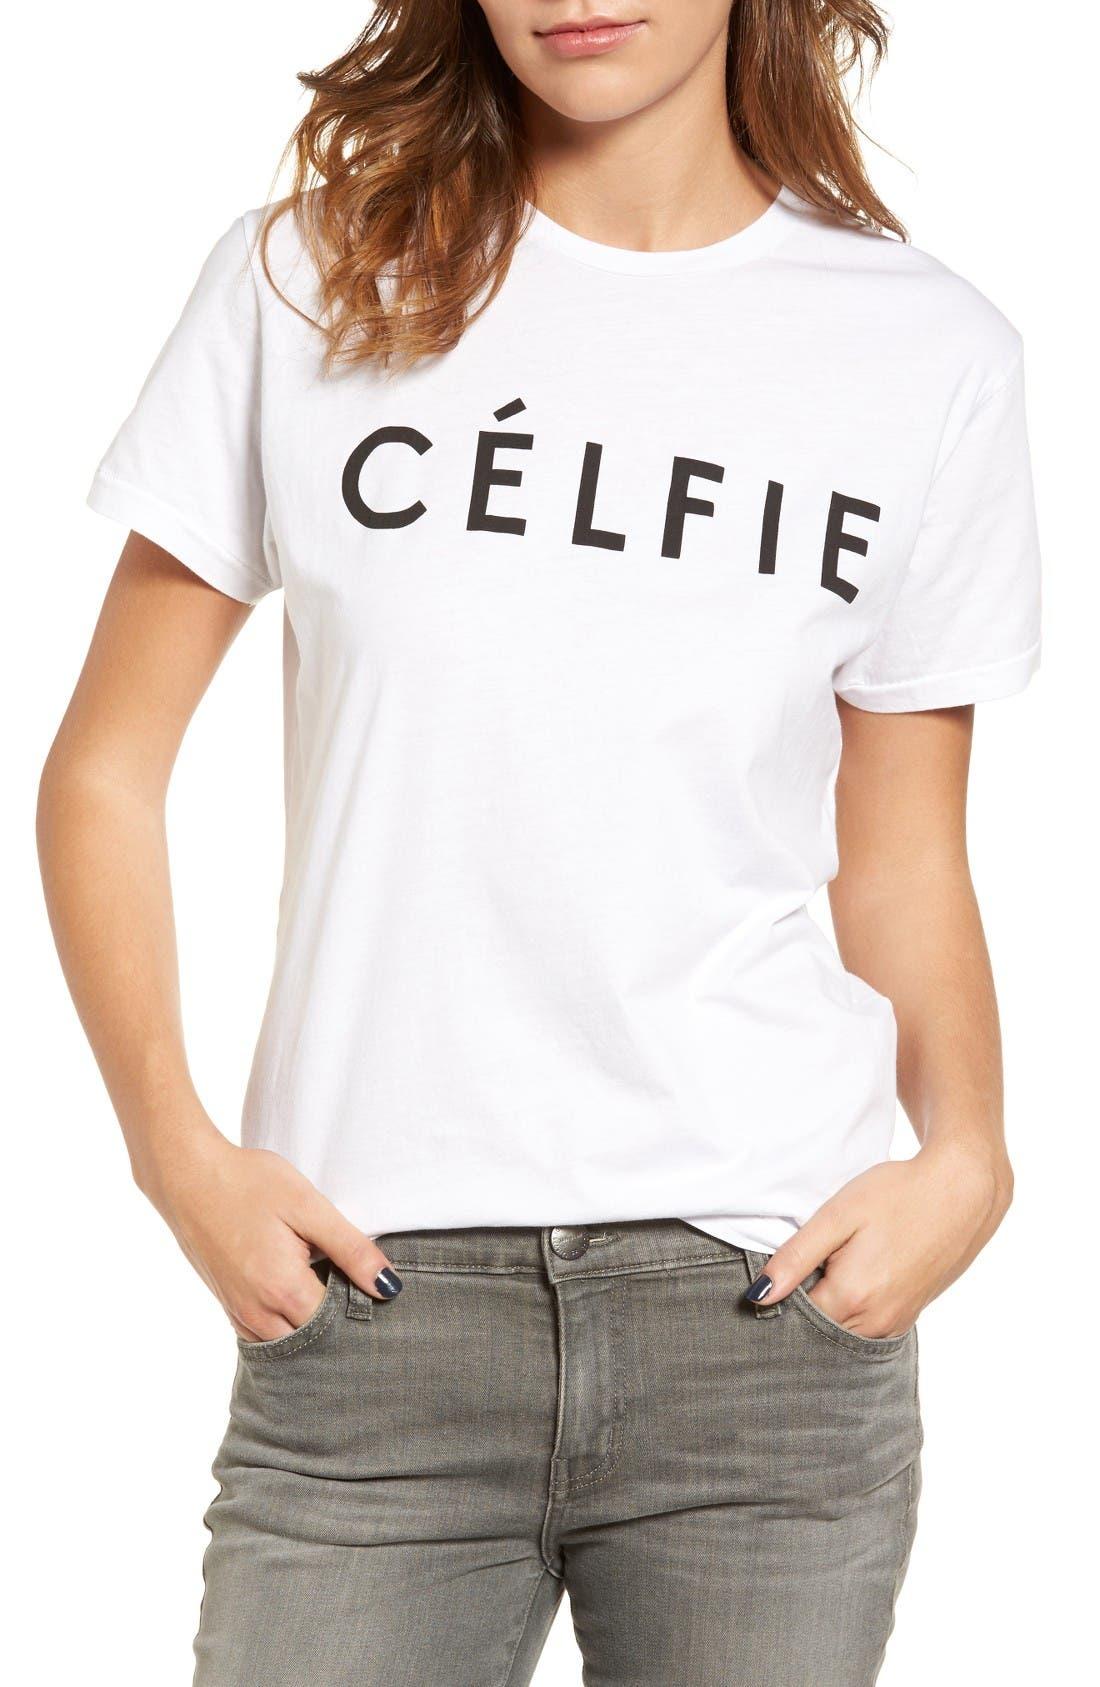 SINCERELY JULES 'Célfie' Graphic Tee